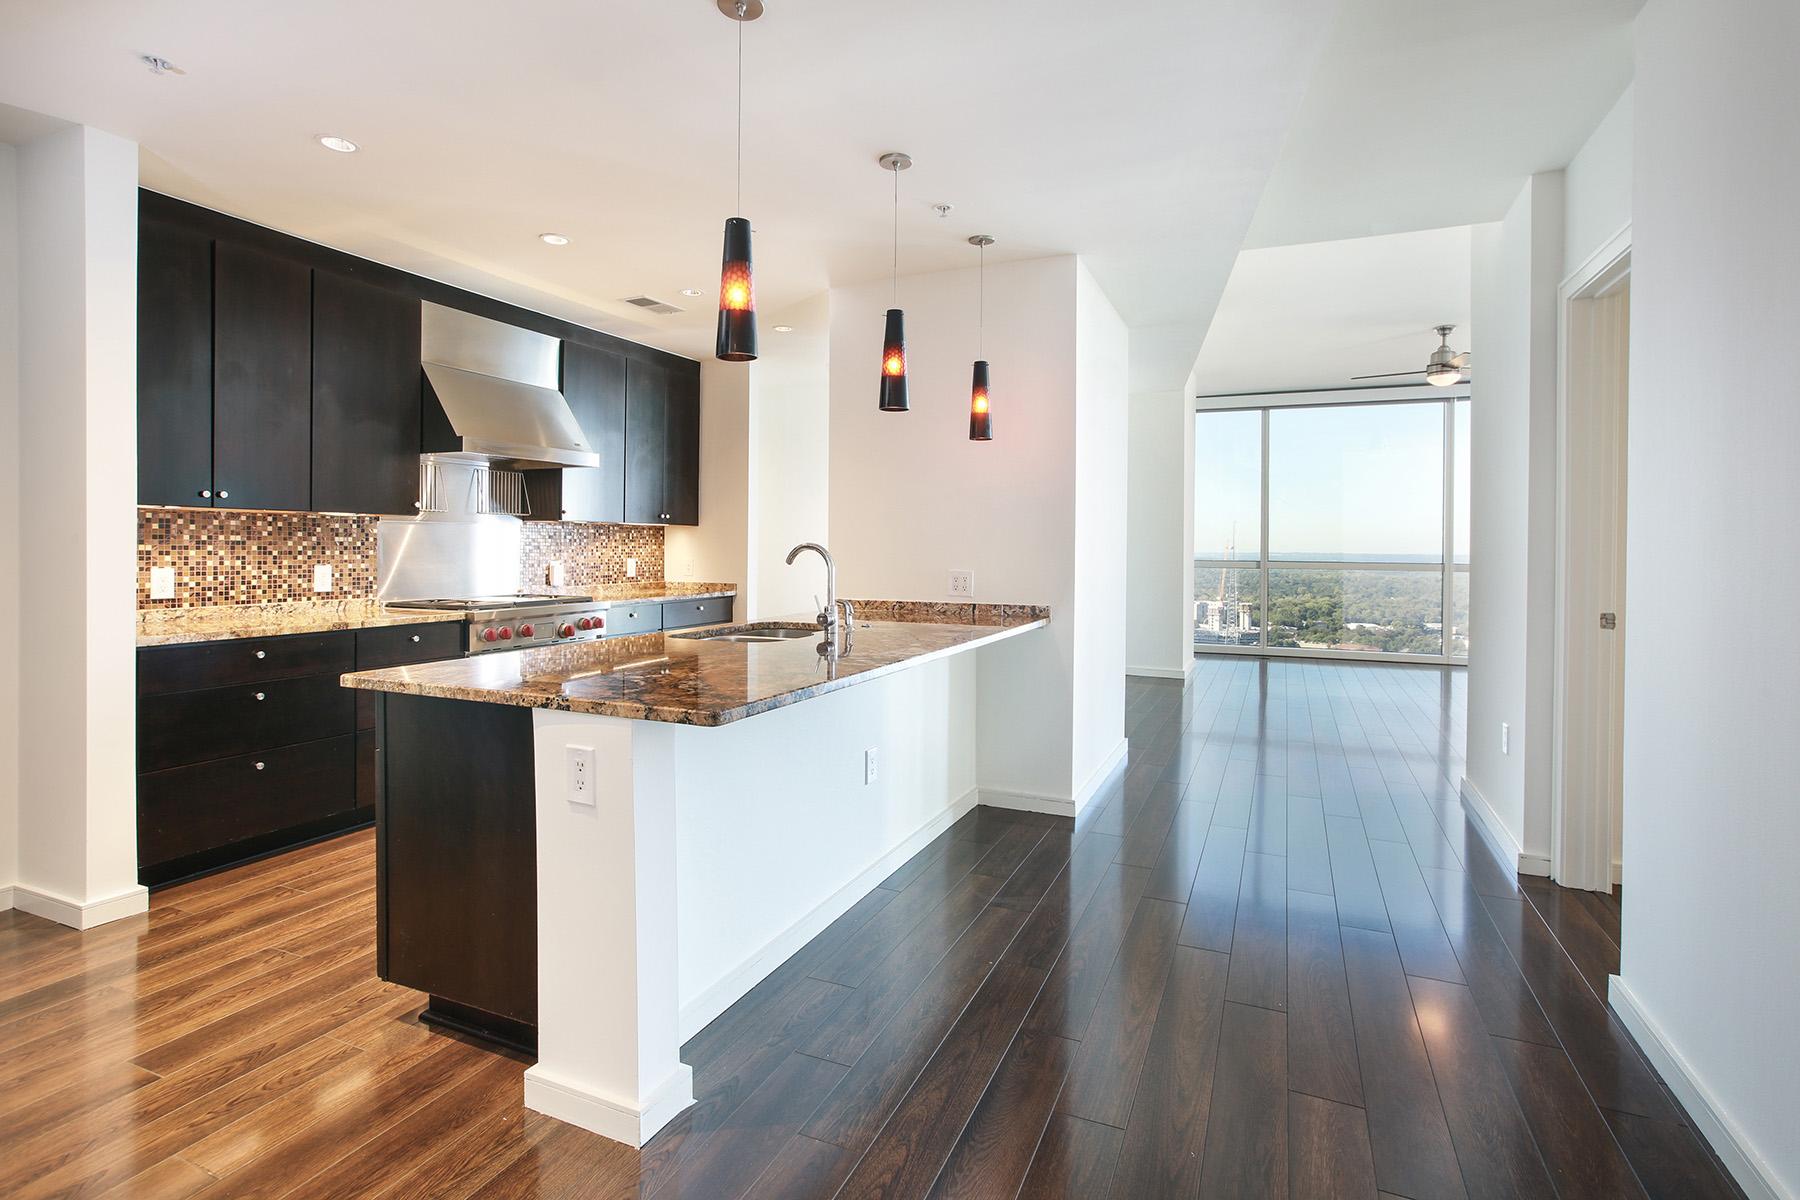 Luxury Living at Terminus, a Prime Buckhead Location 3325 Piedmont Road NE #3002 Atlanta, Georgia 30305 Hoa Kỳ